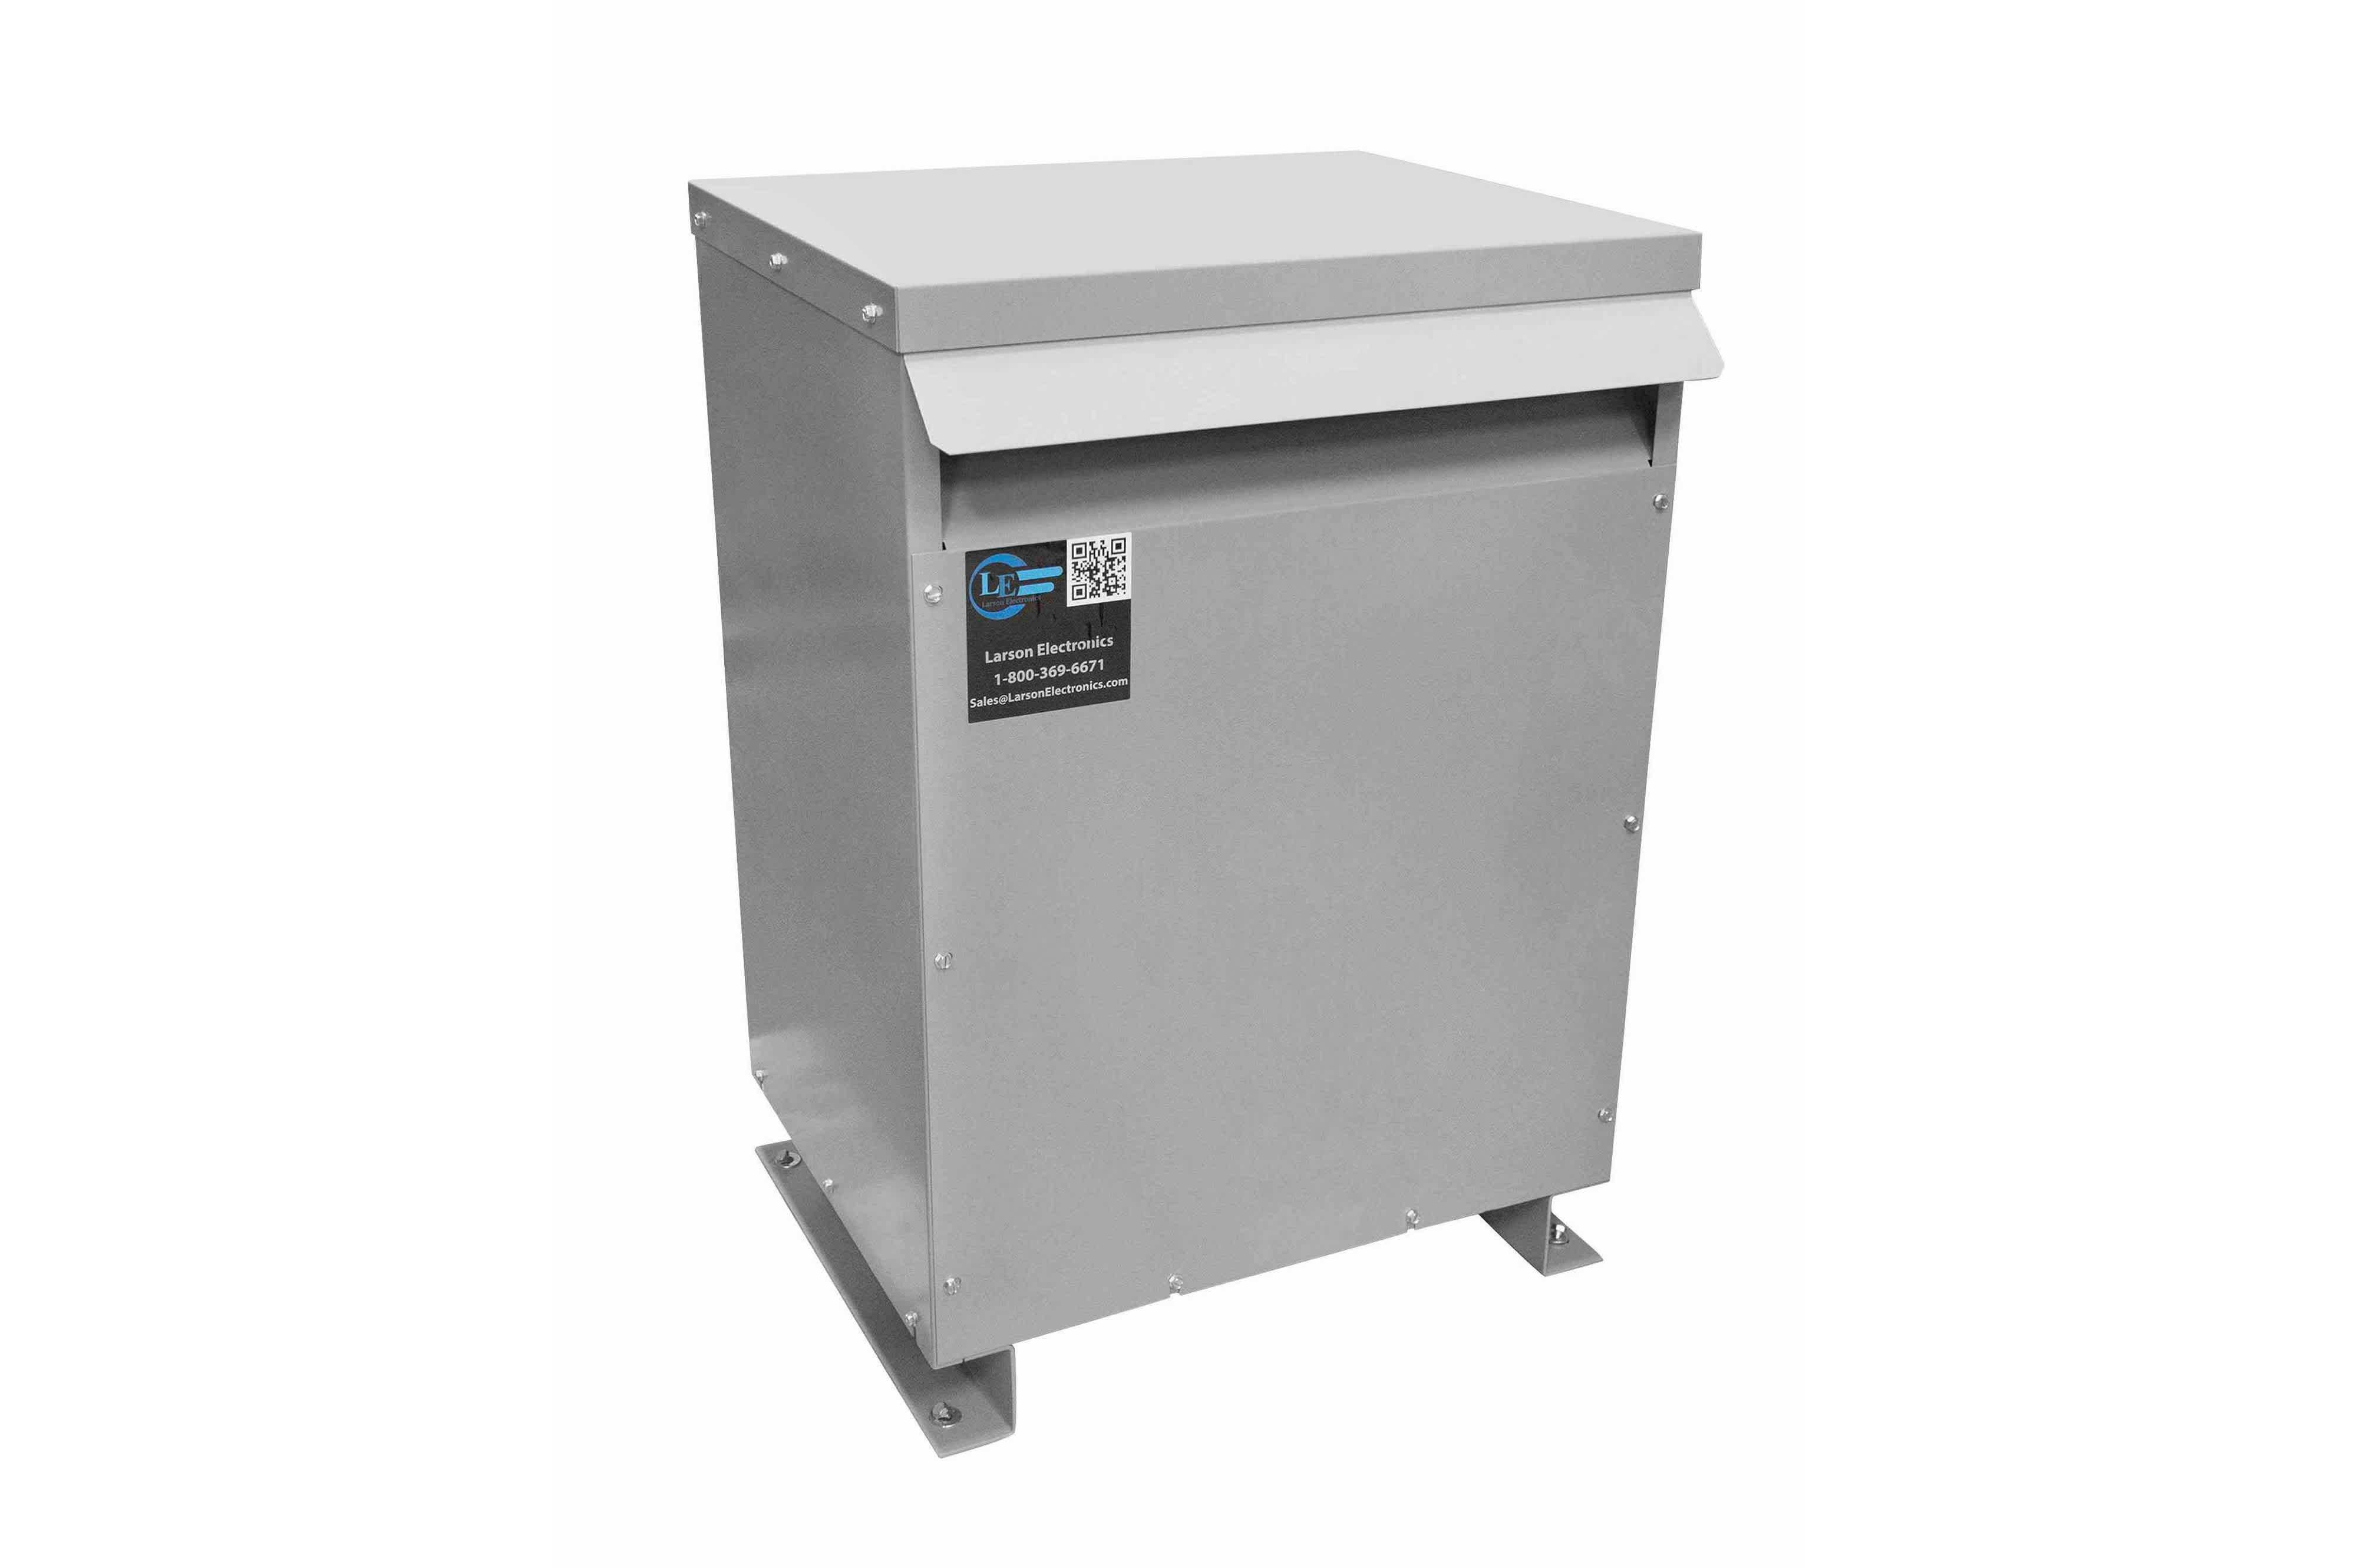 110 kVA 3PH Isolation Transformer, 480V Wye Primary, 208Y/120 Wye-N Secondary, N3R, Ventilated, 60 Hz